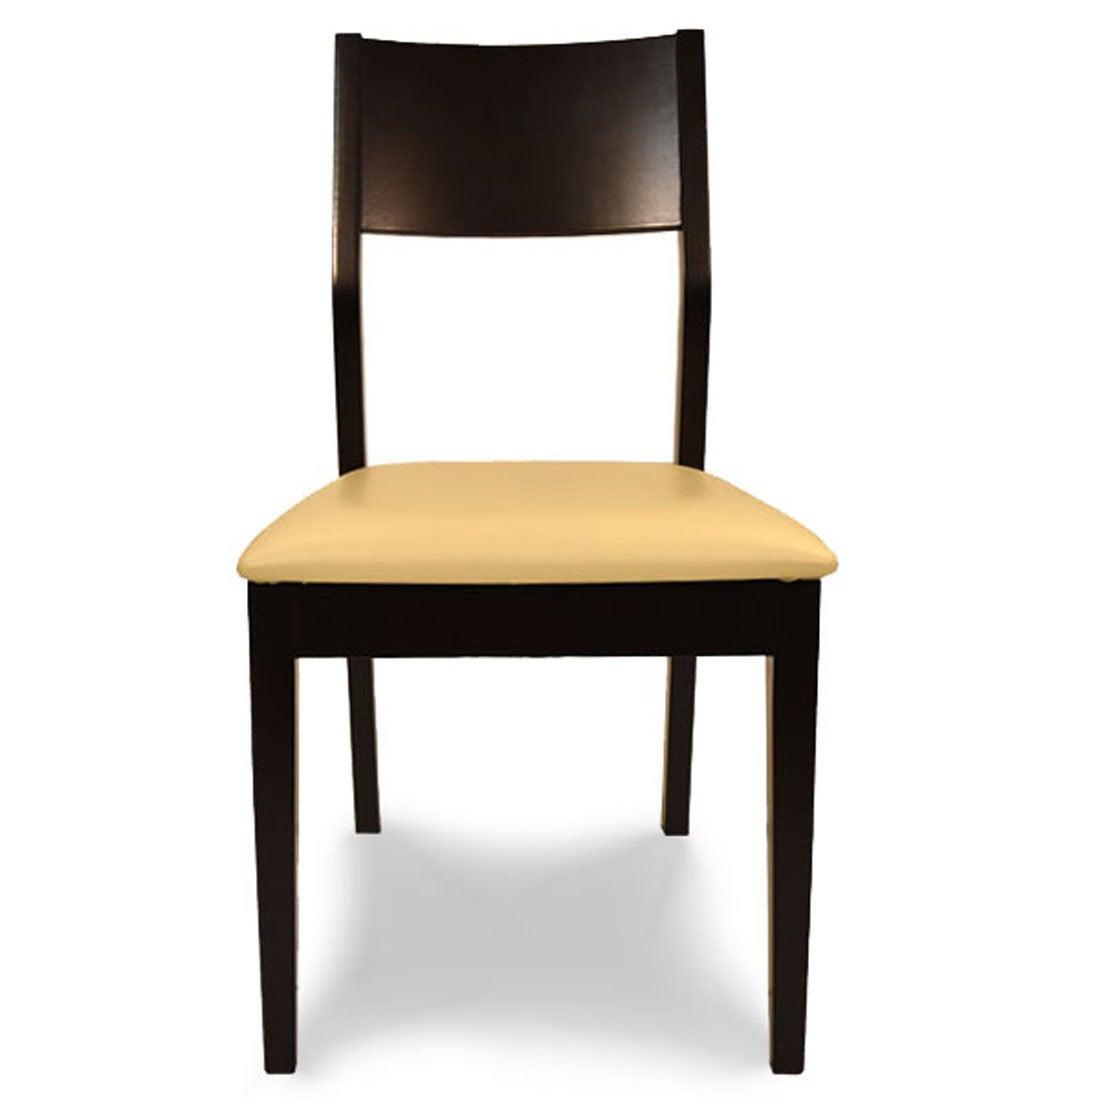 IDC OTSUKA/大塚家具 椅子 AX2 PVC IV/DB ビーチ (ダークブラウン)